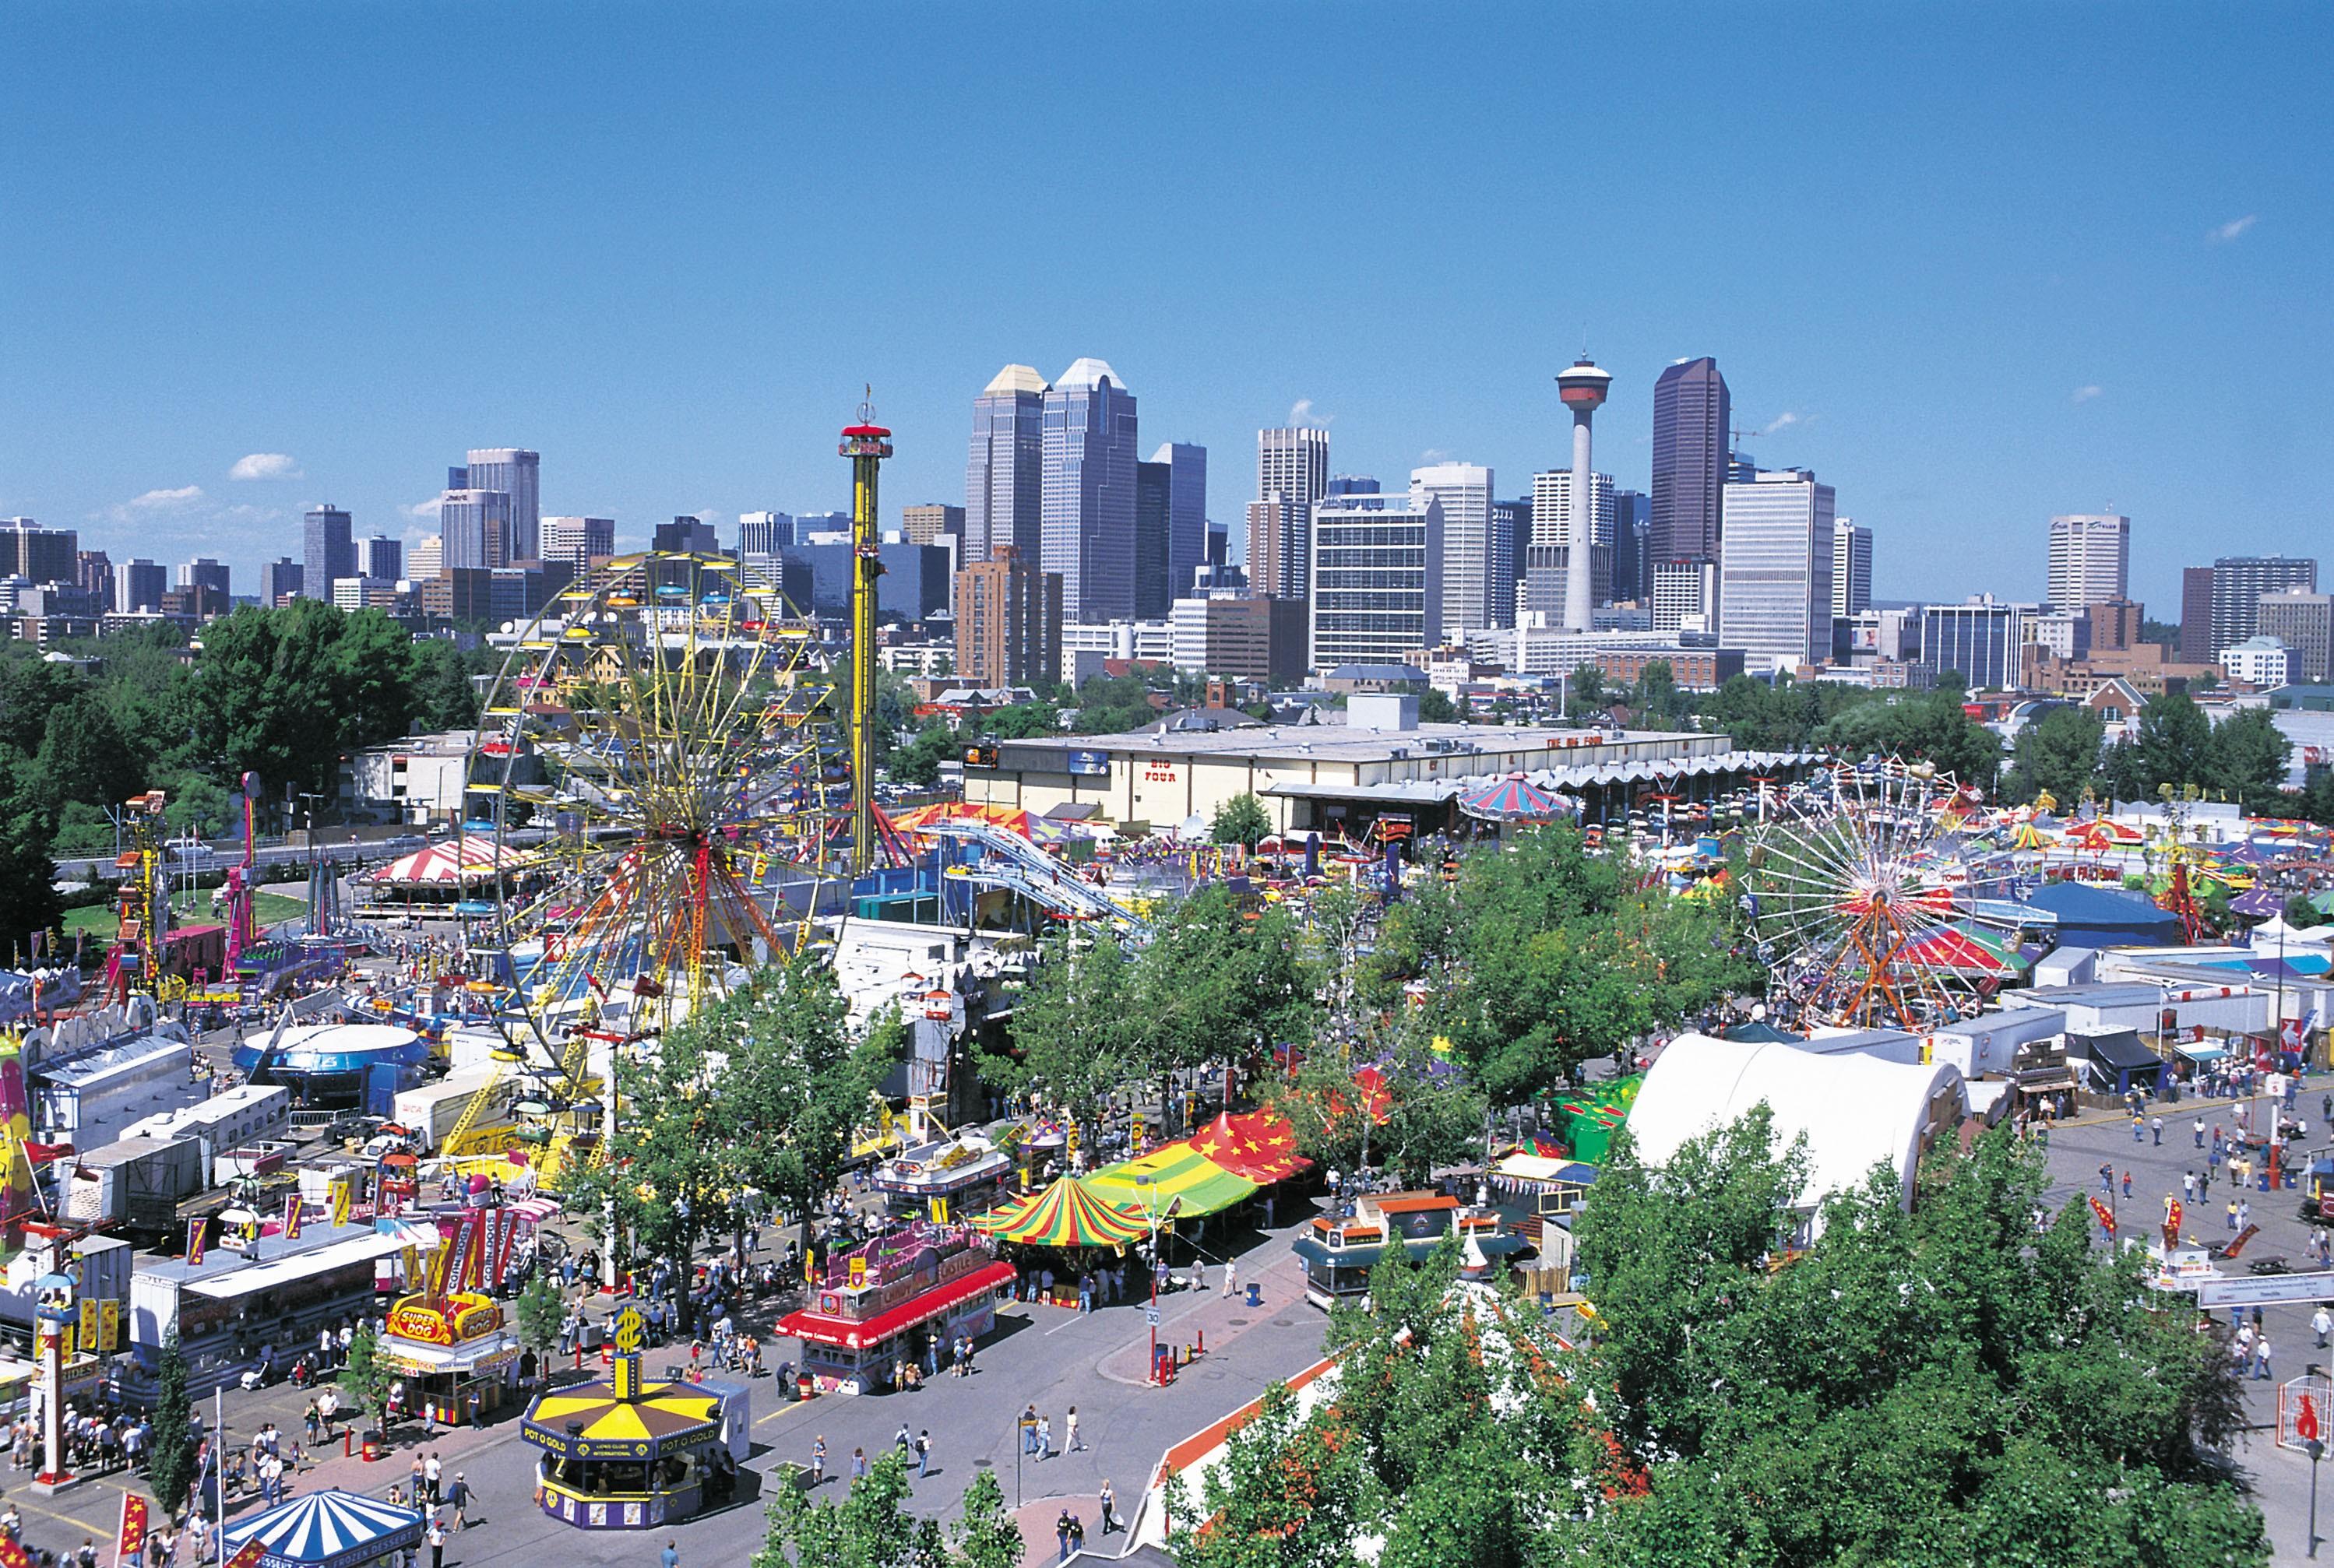 Calgary Stampede Alberta.jpg